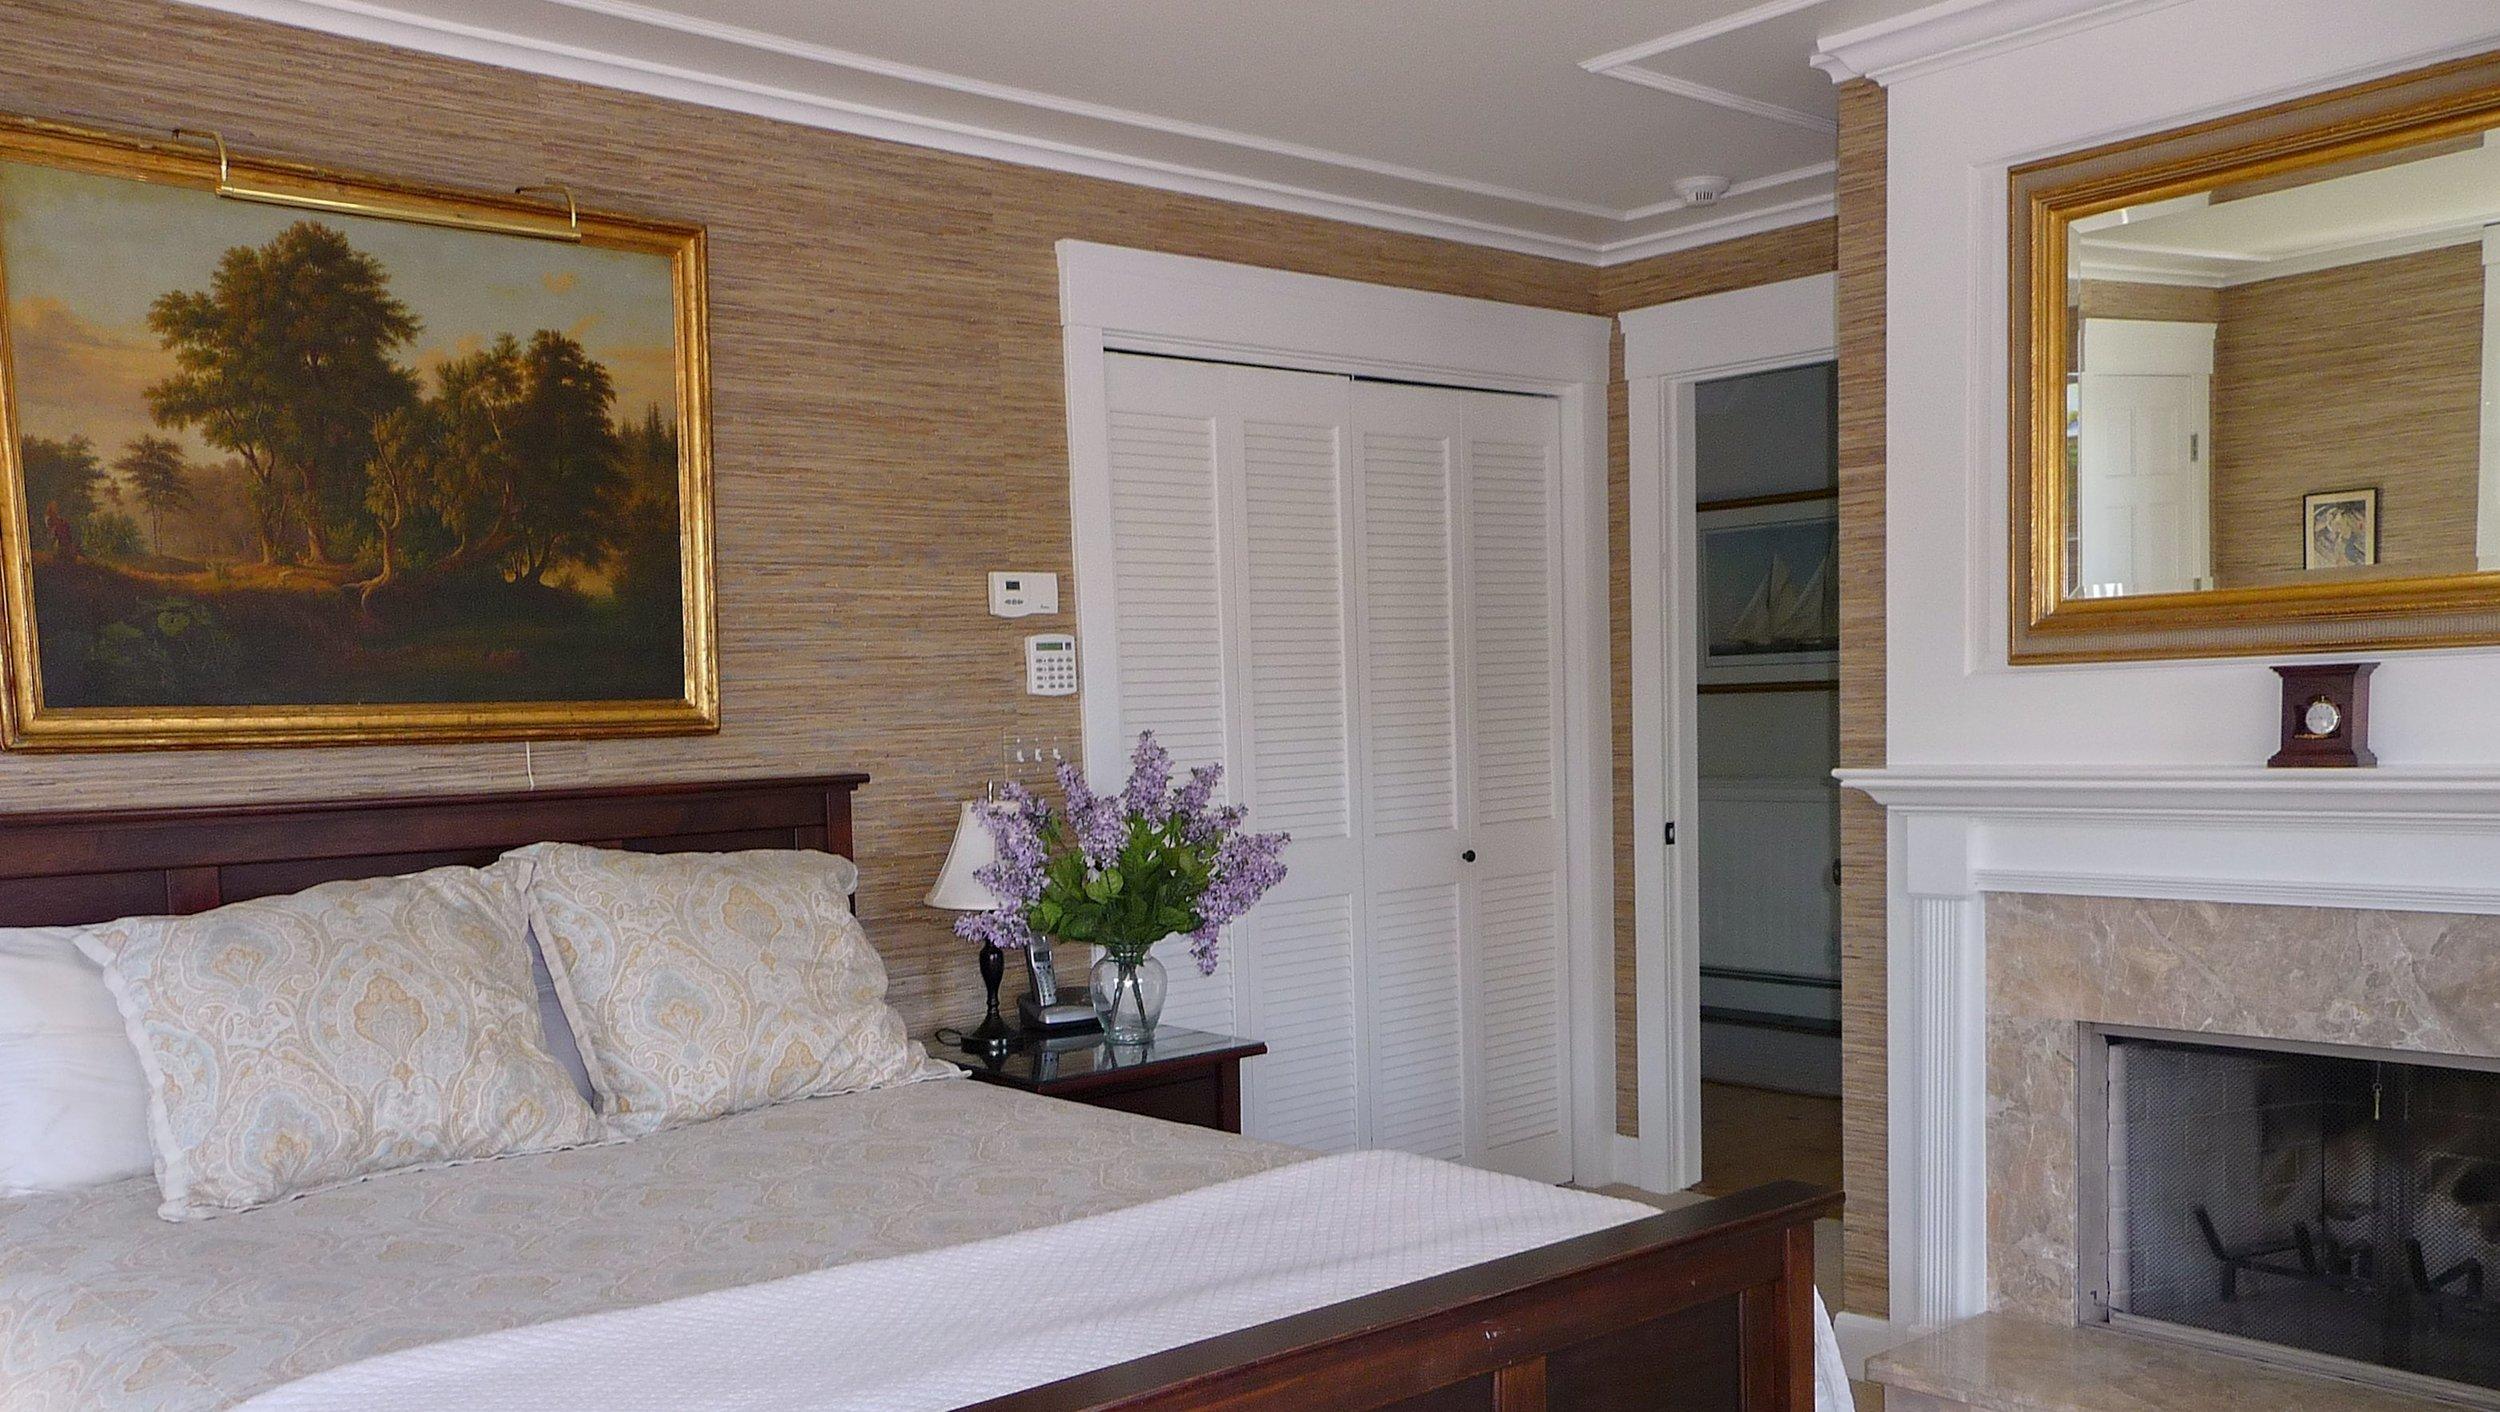 Colonial_Bedroom_Fireplace.jpg